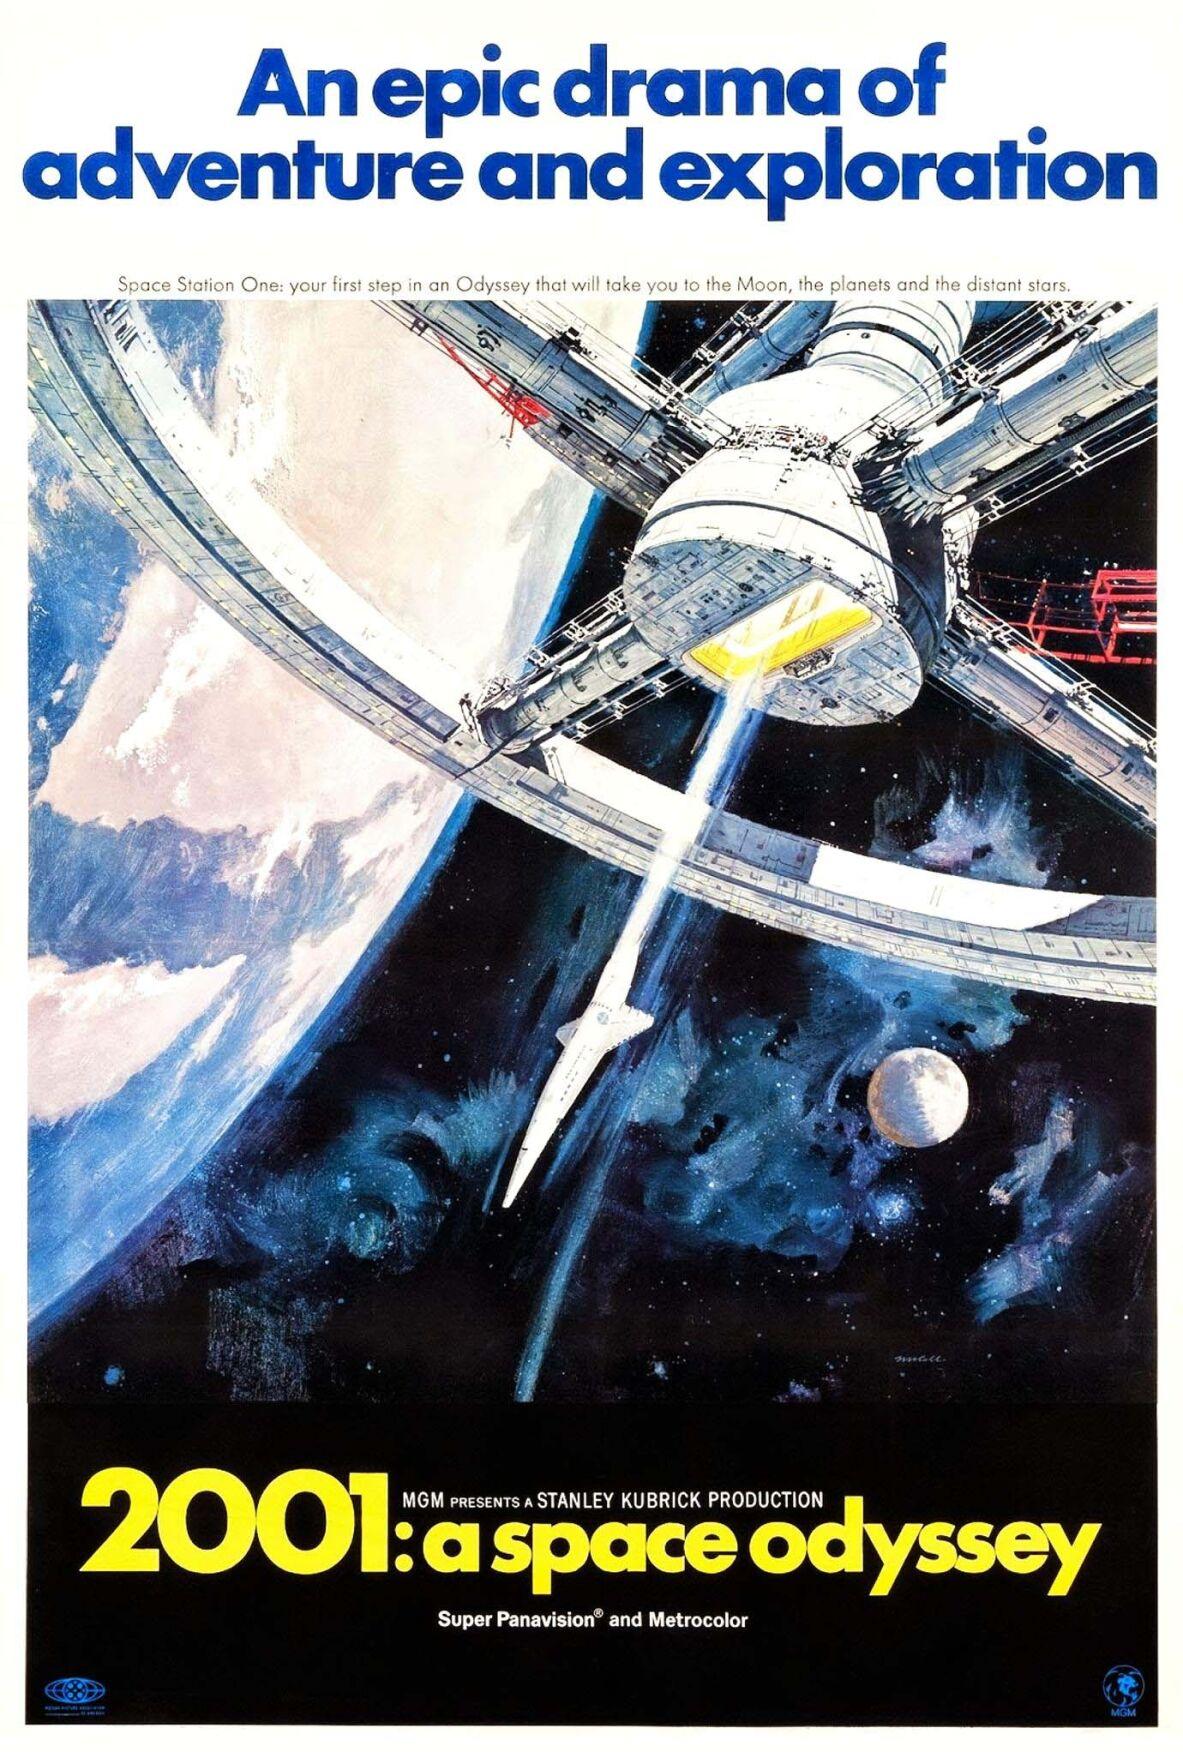 space poster.jpg